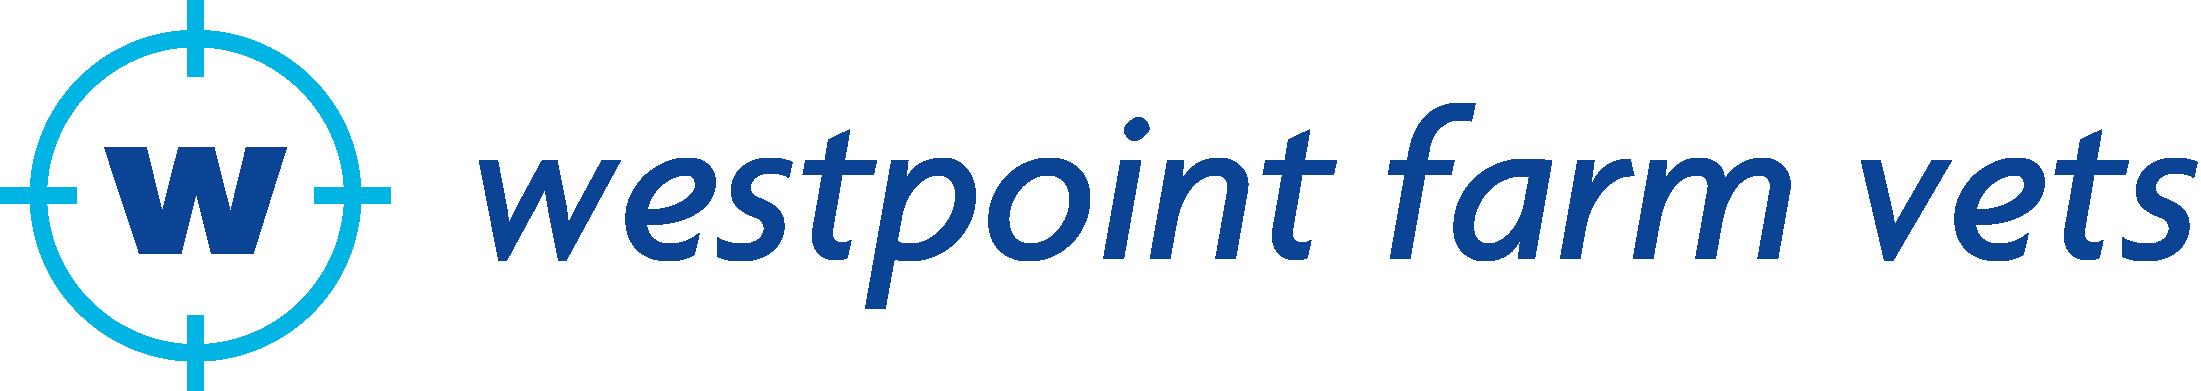 Westpoint Farm Vets Logo